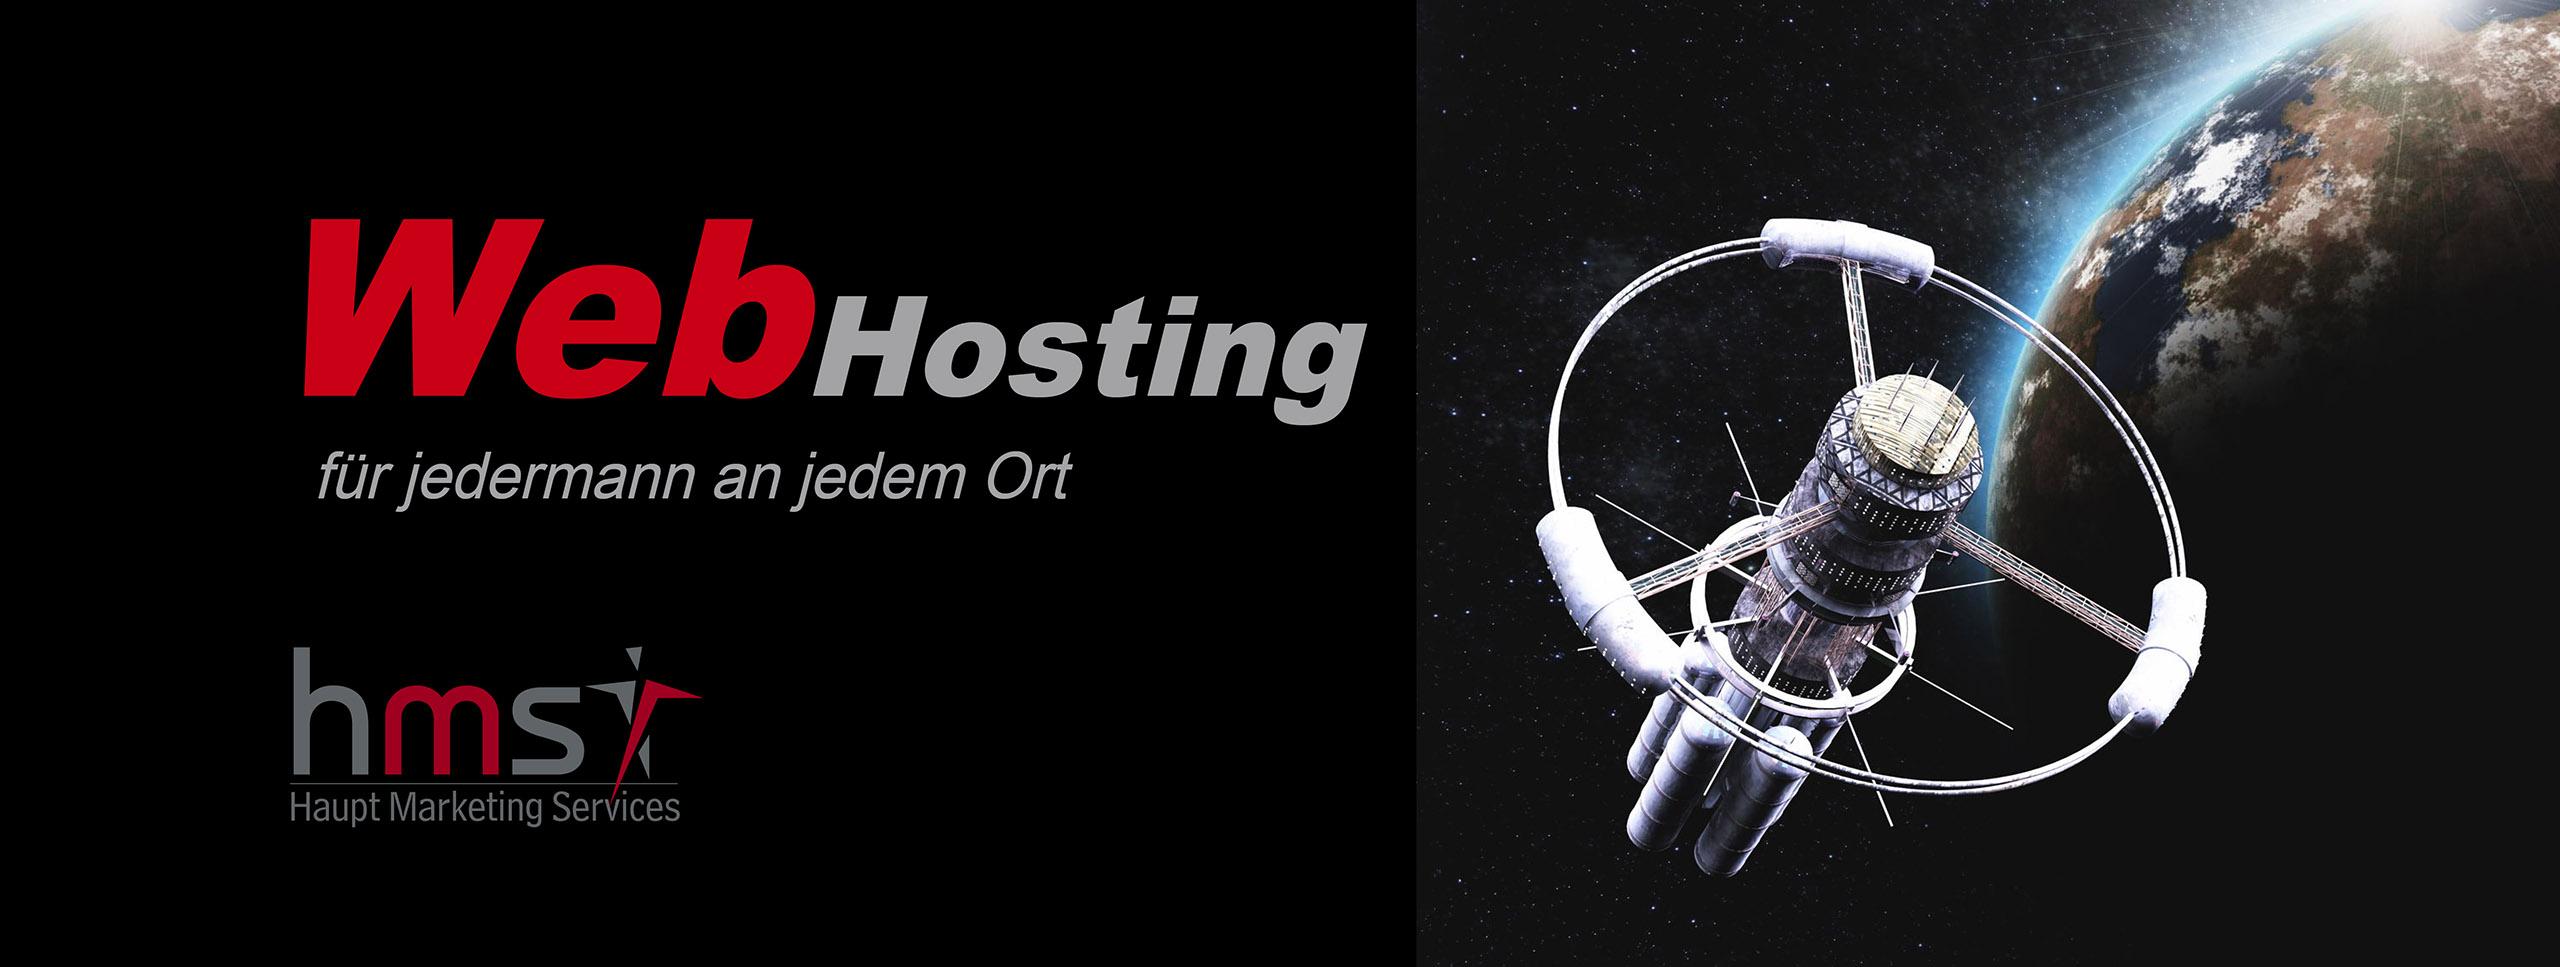 008_Web01_2017_Webhosting